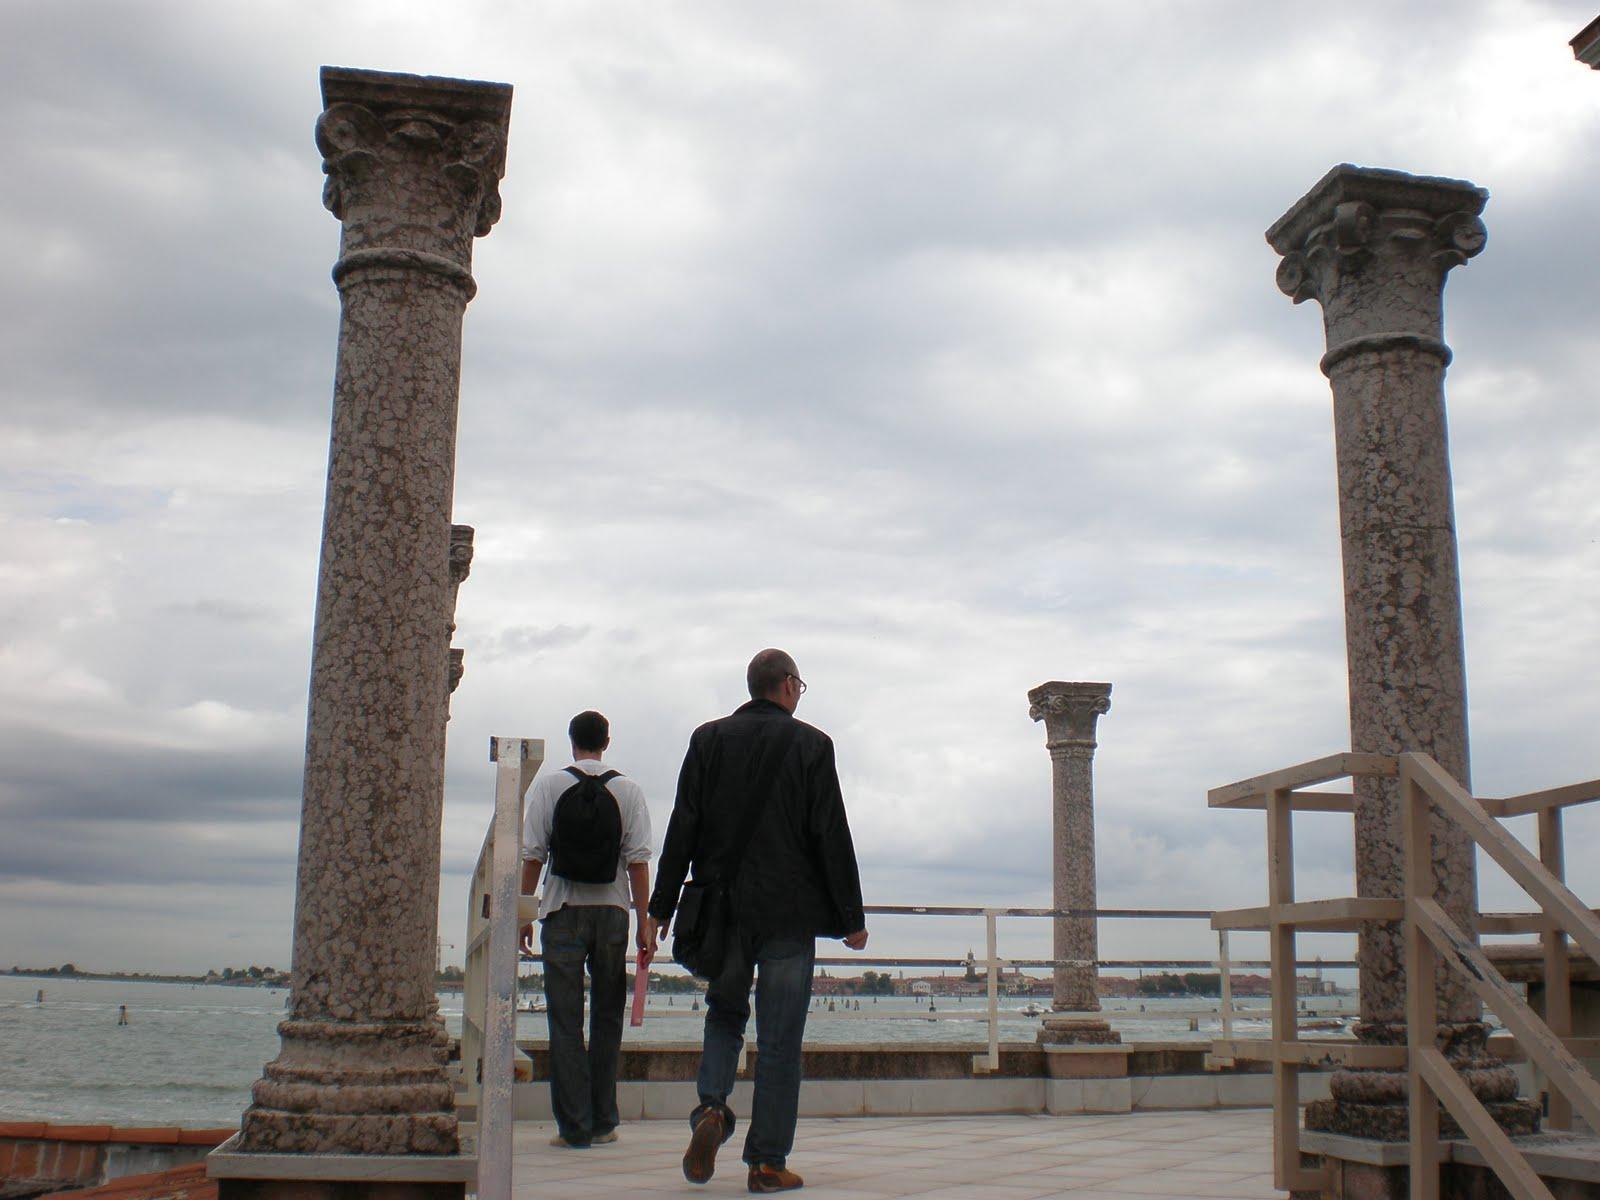 Venezia venezia degli spiriti eletti for Spirit colonna sonora